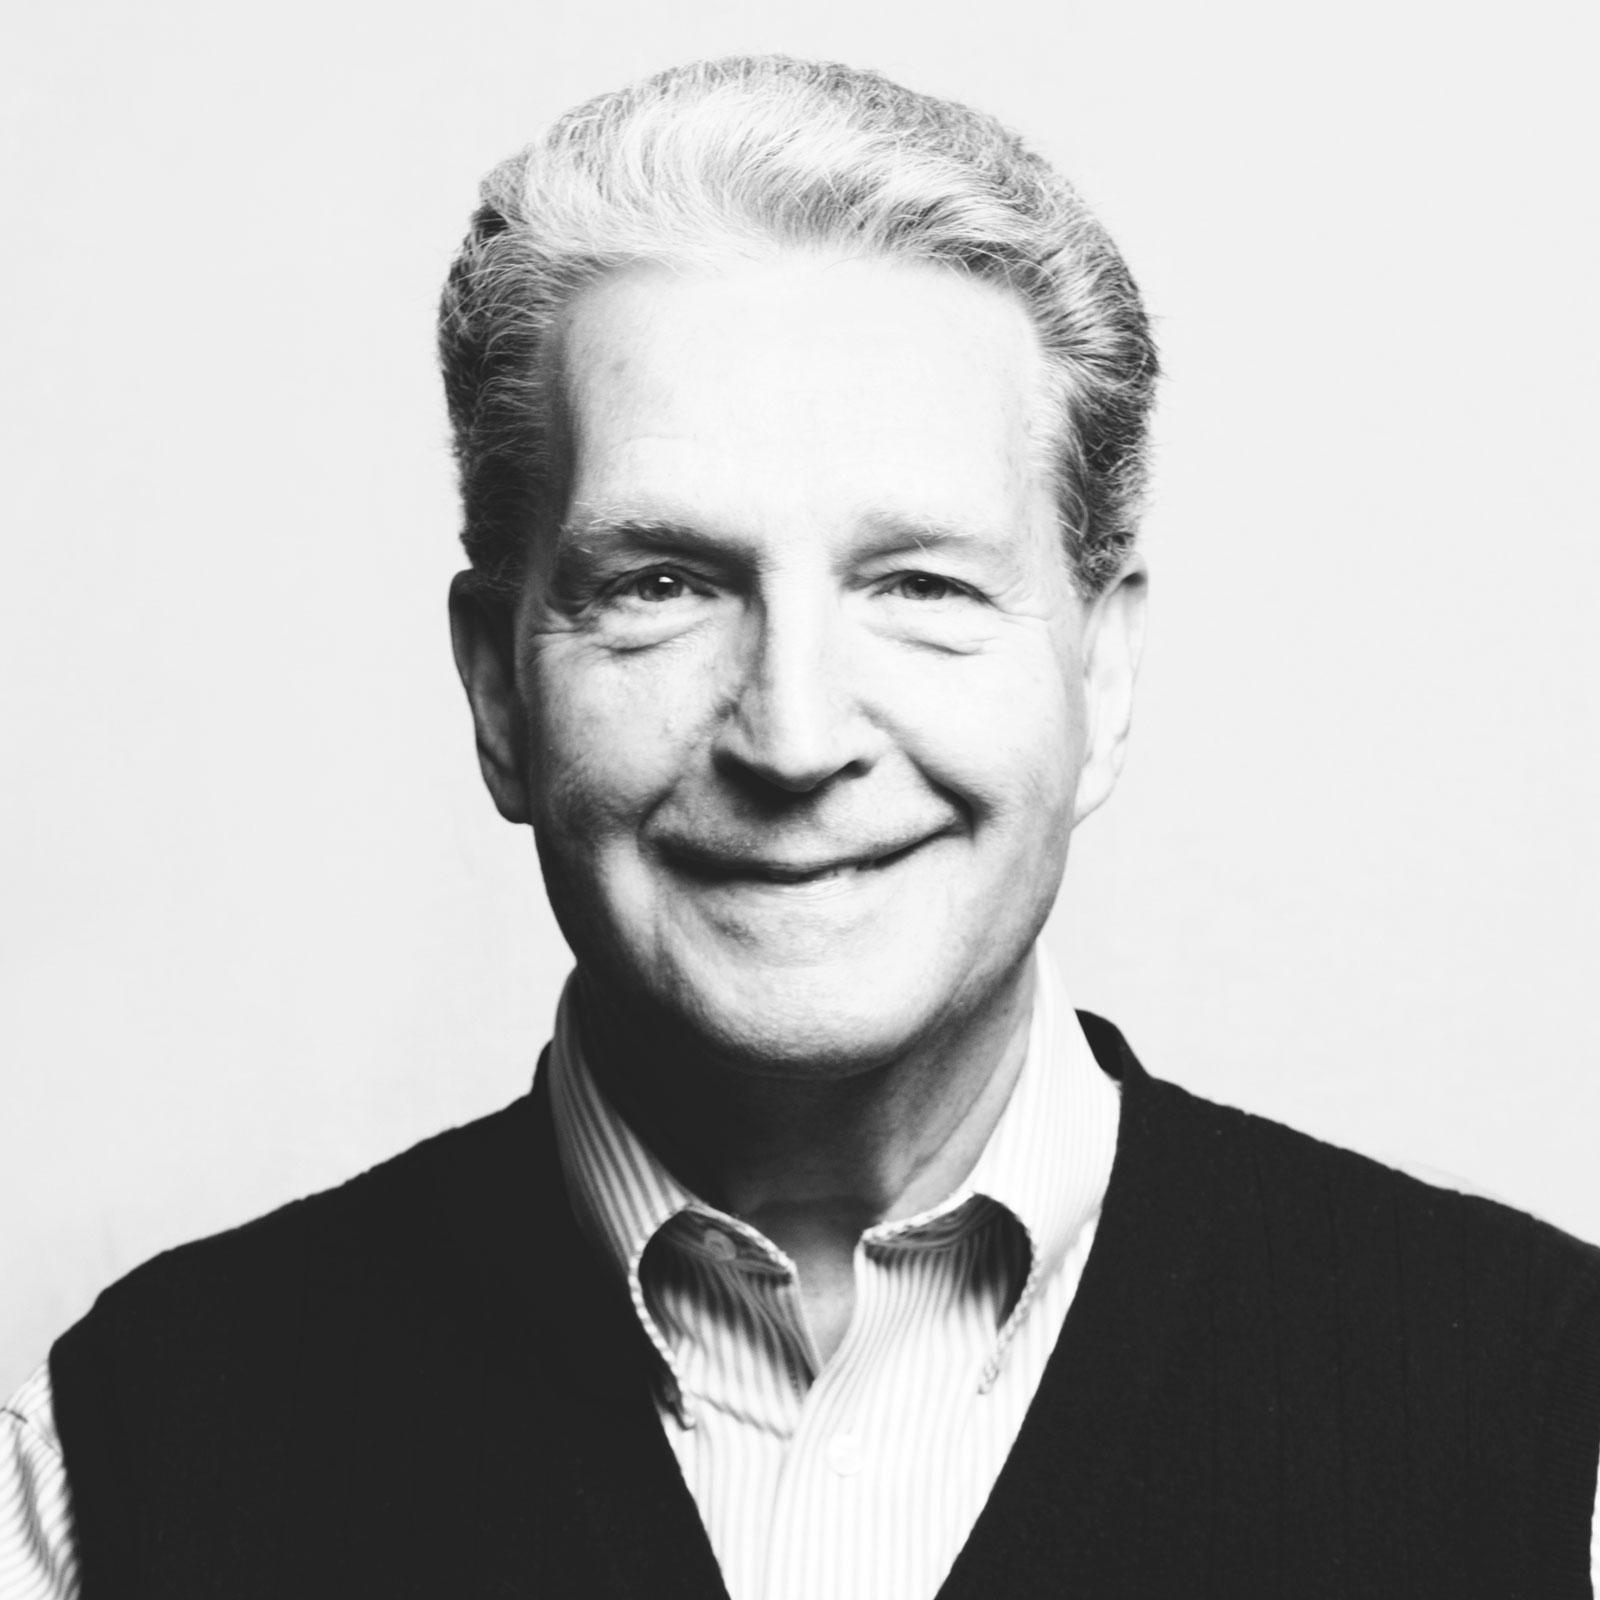 "<a href=""https://christianstandard.com/author/davidroadcup/"" target=""_self"">David Roadcup</a>"